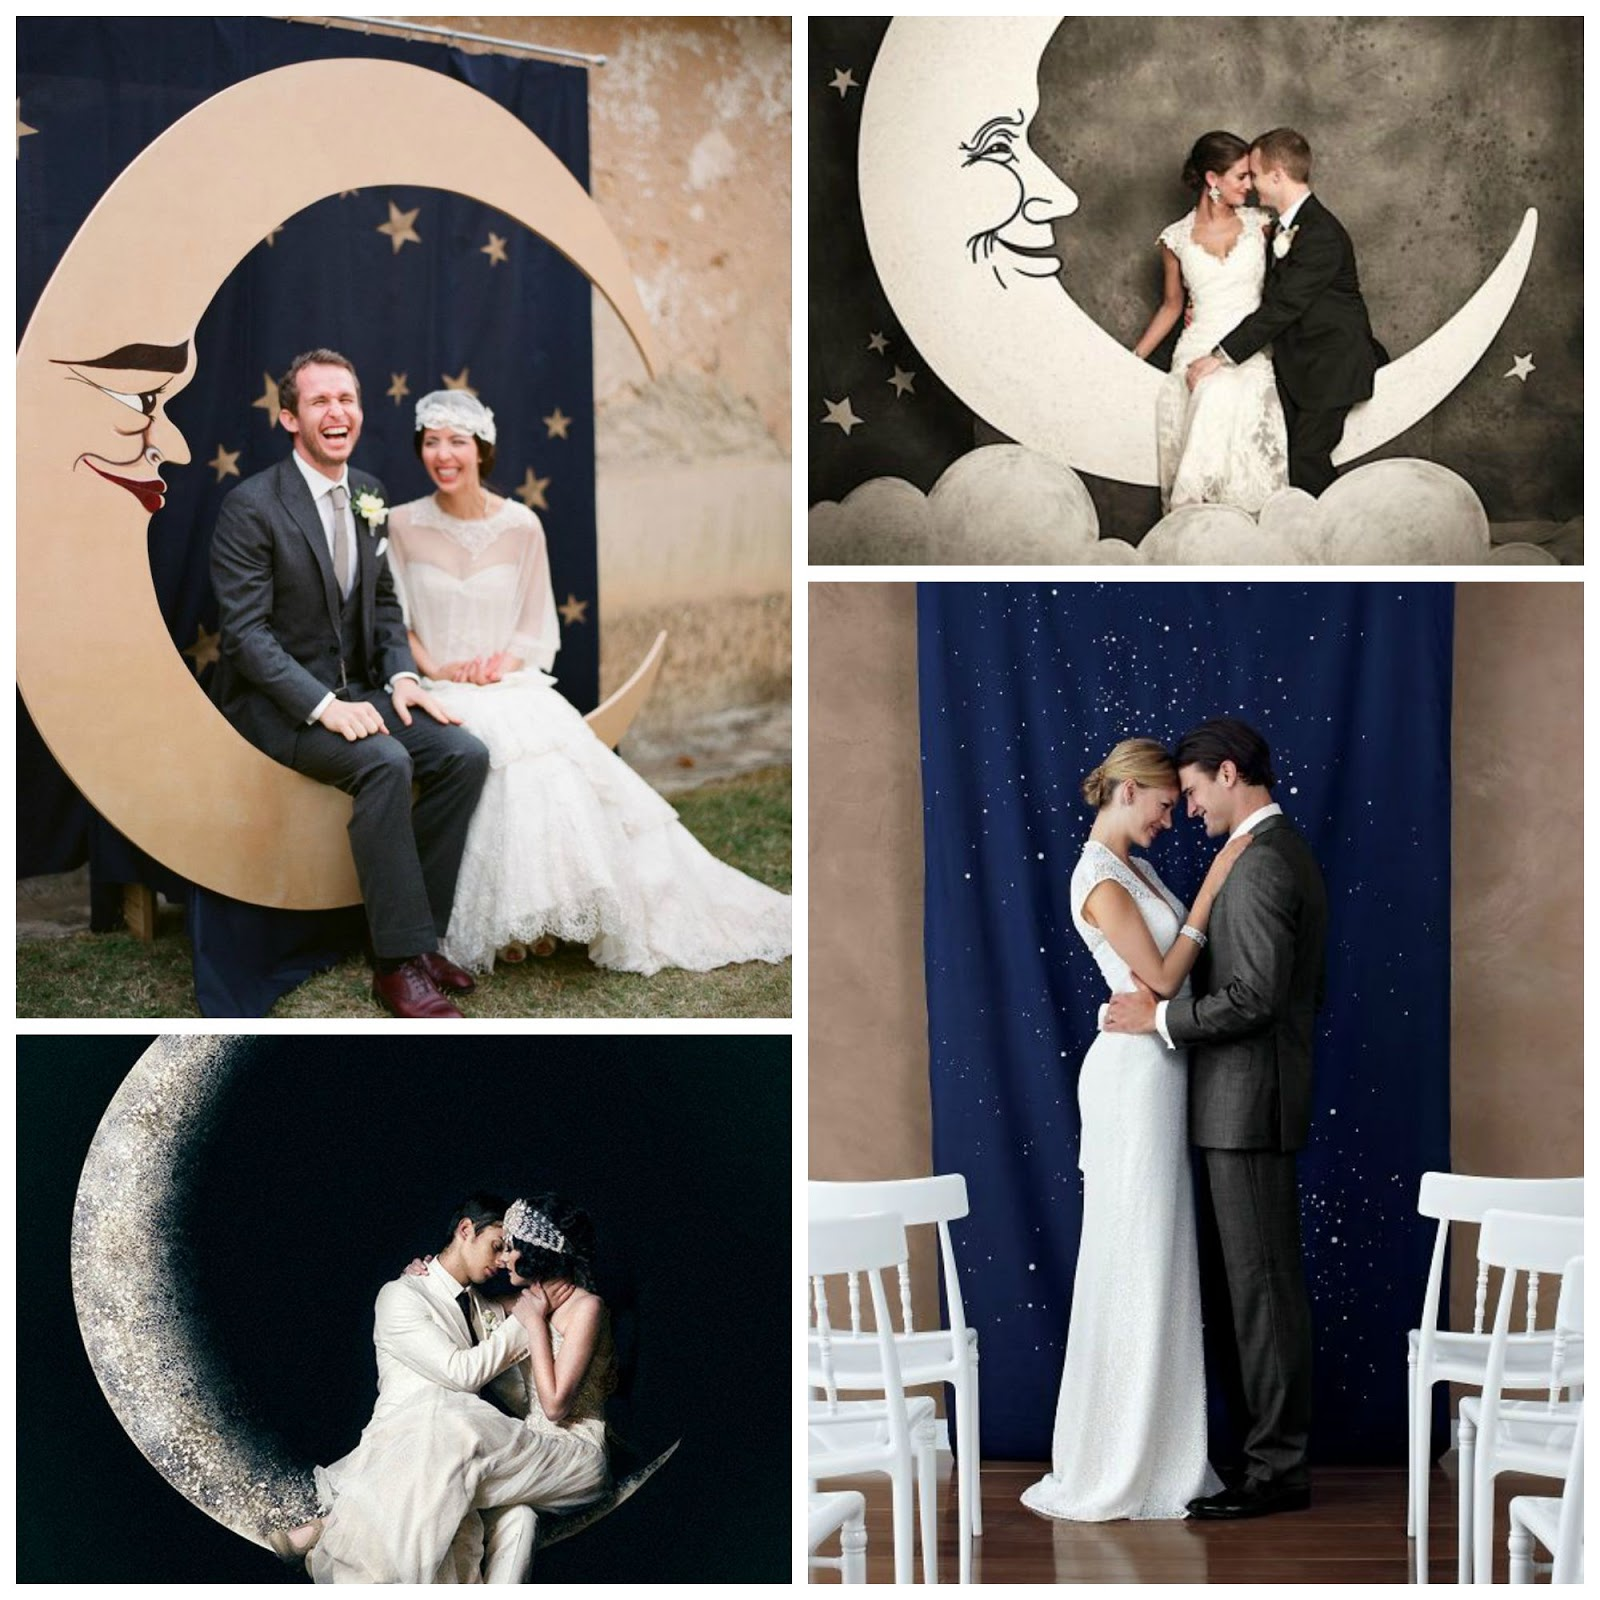 Blog mi boda inspiraci n para una boda c smica - Photocall boda casero ...